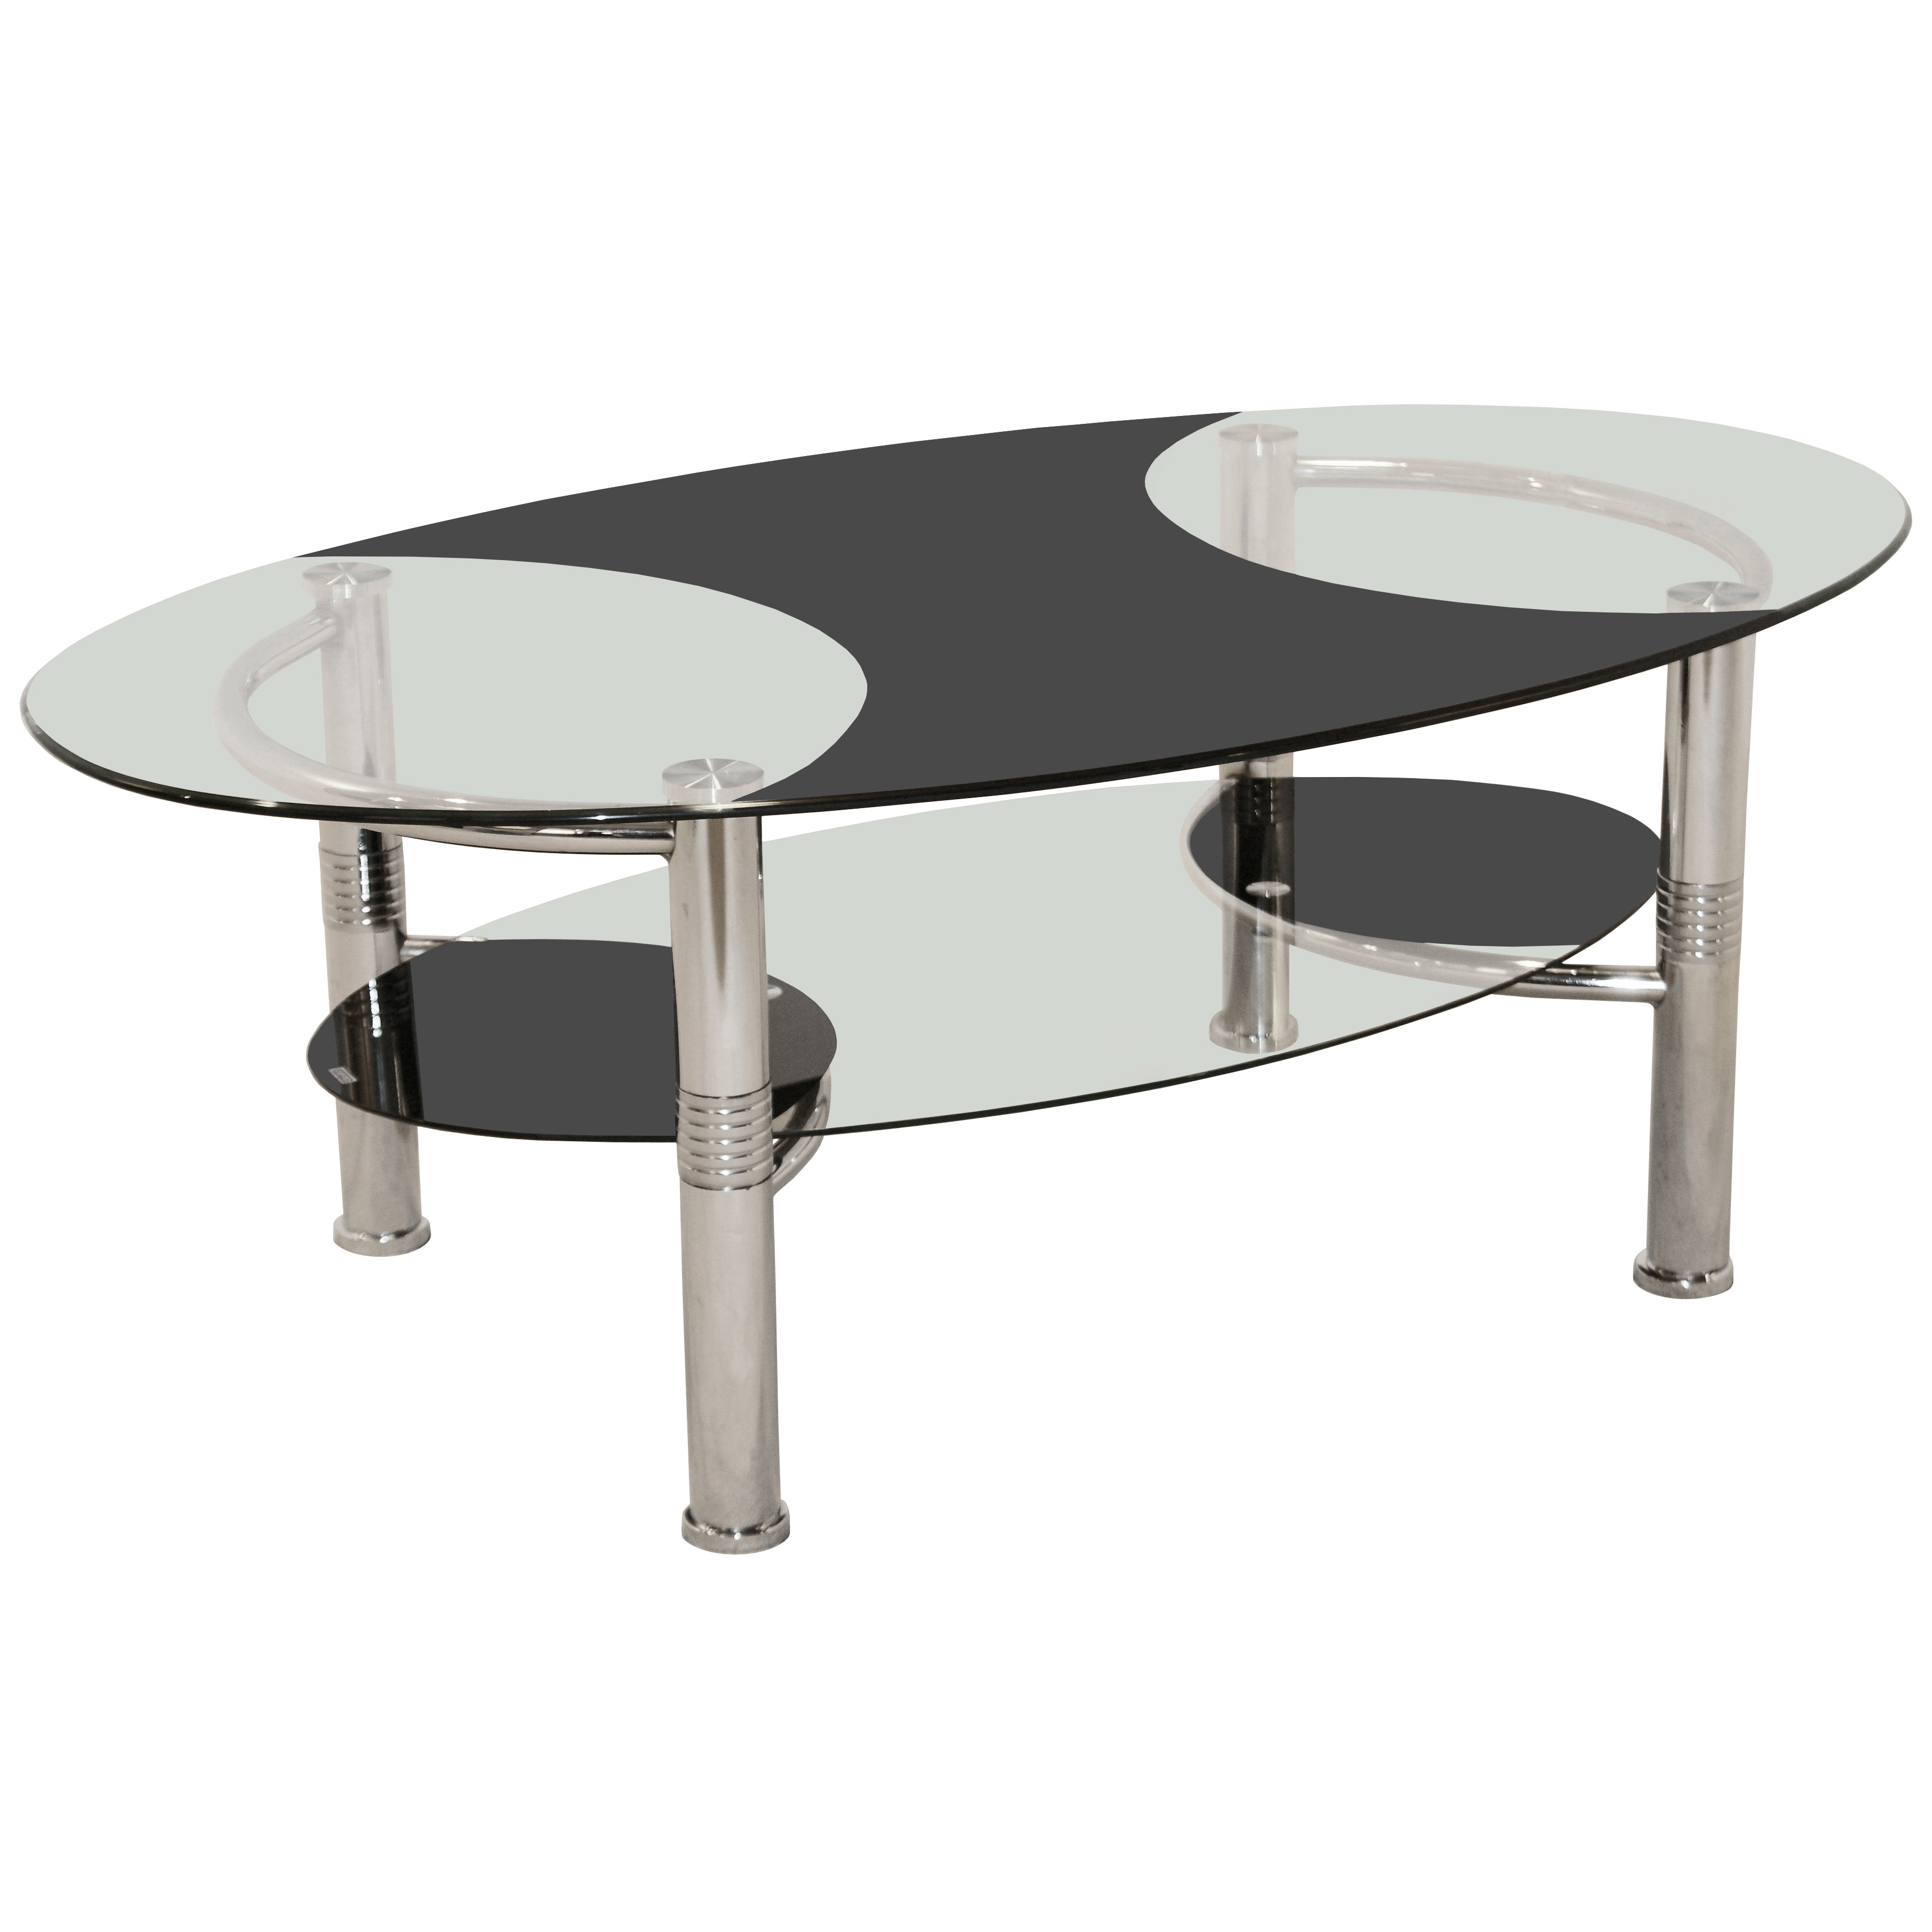 Ebay Iron Glass Coffee Table: Chrome Metal & Glass Oval Coffee Table With Shelf